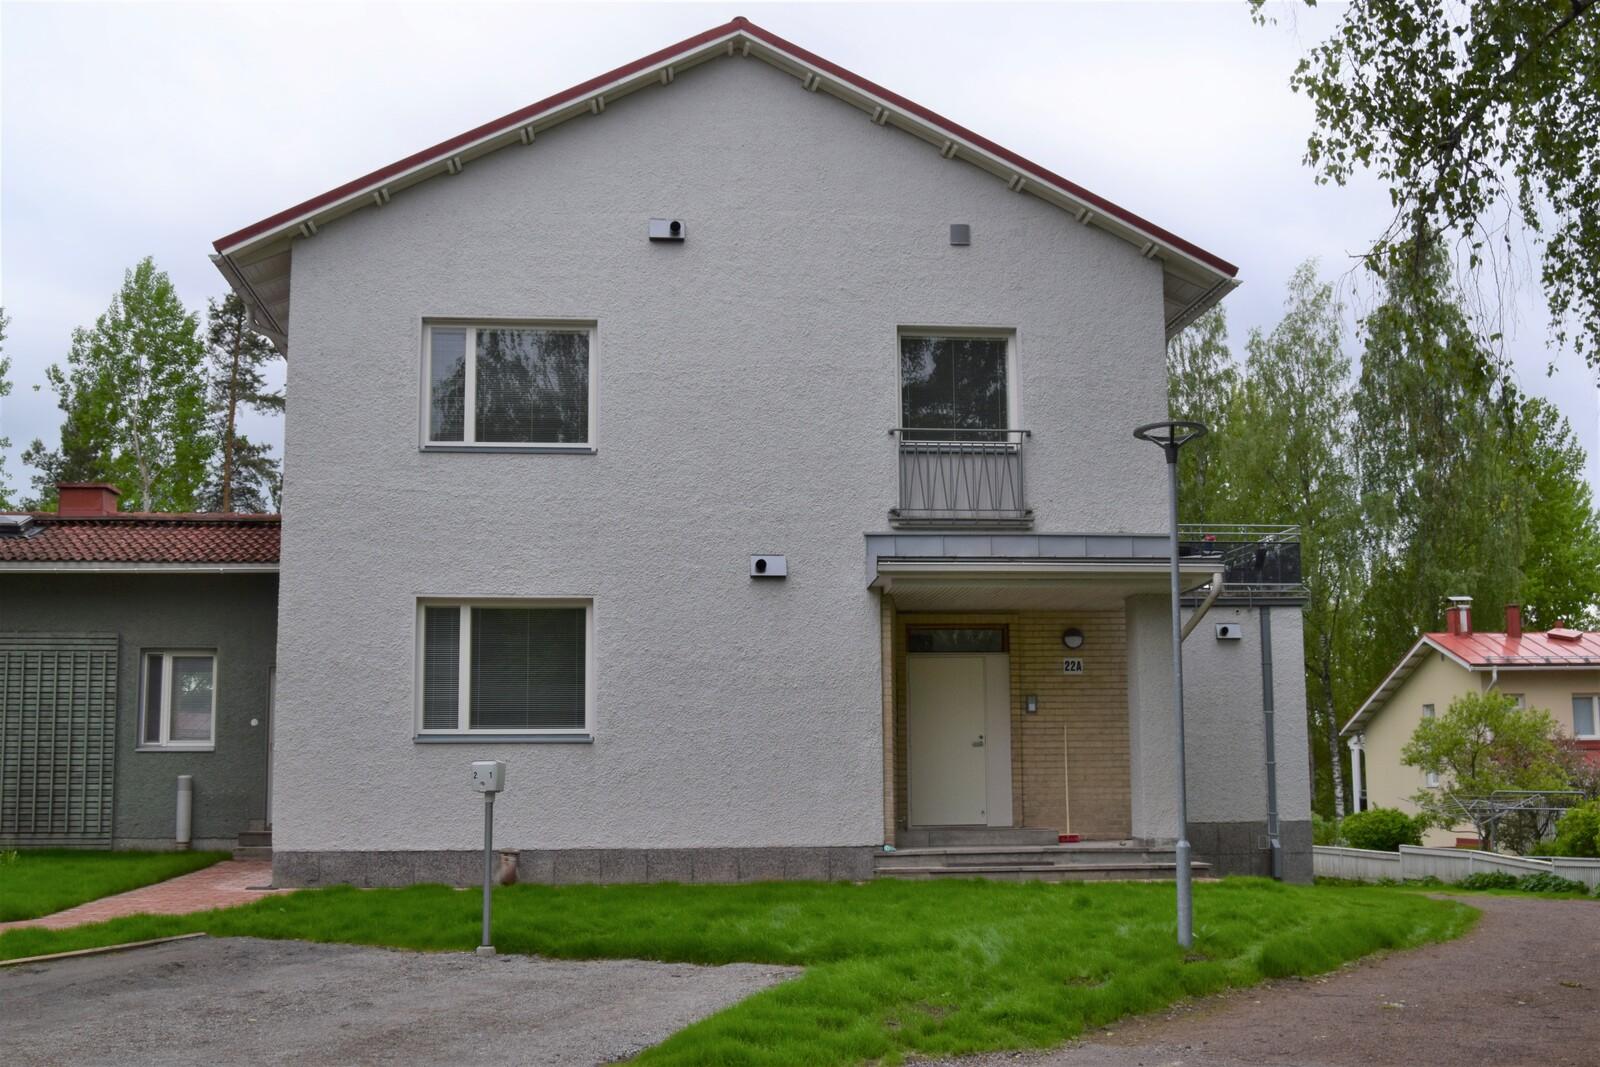 Kahilaniemi, Lappeenranta